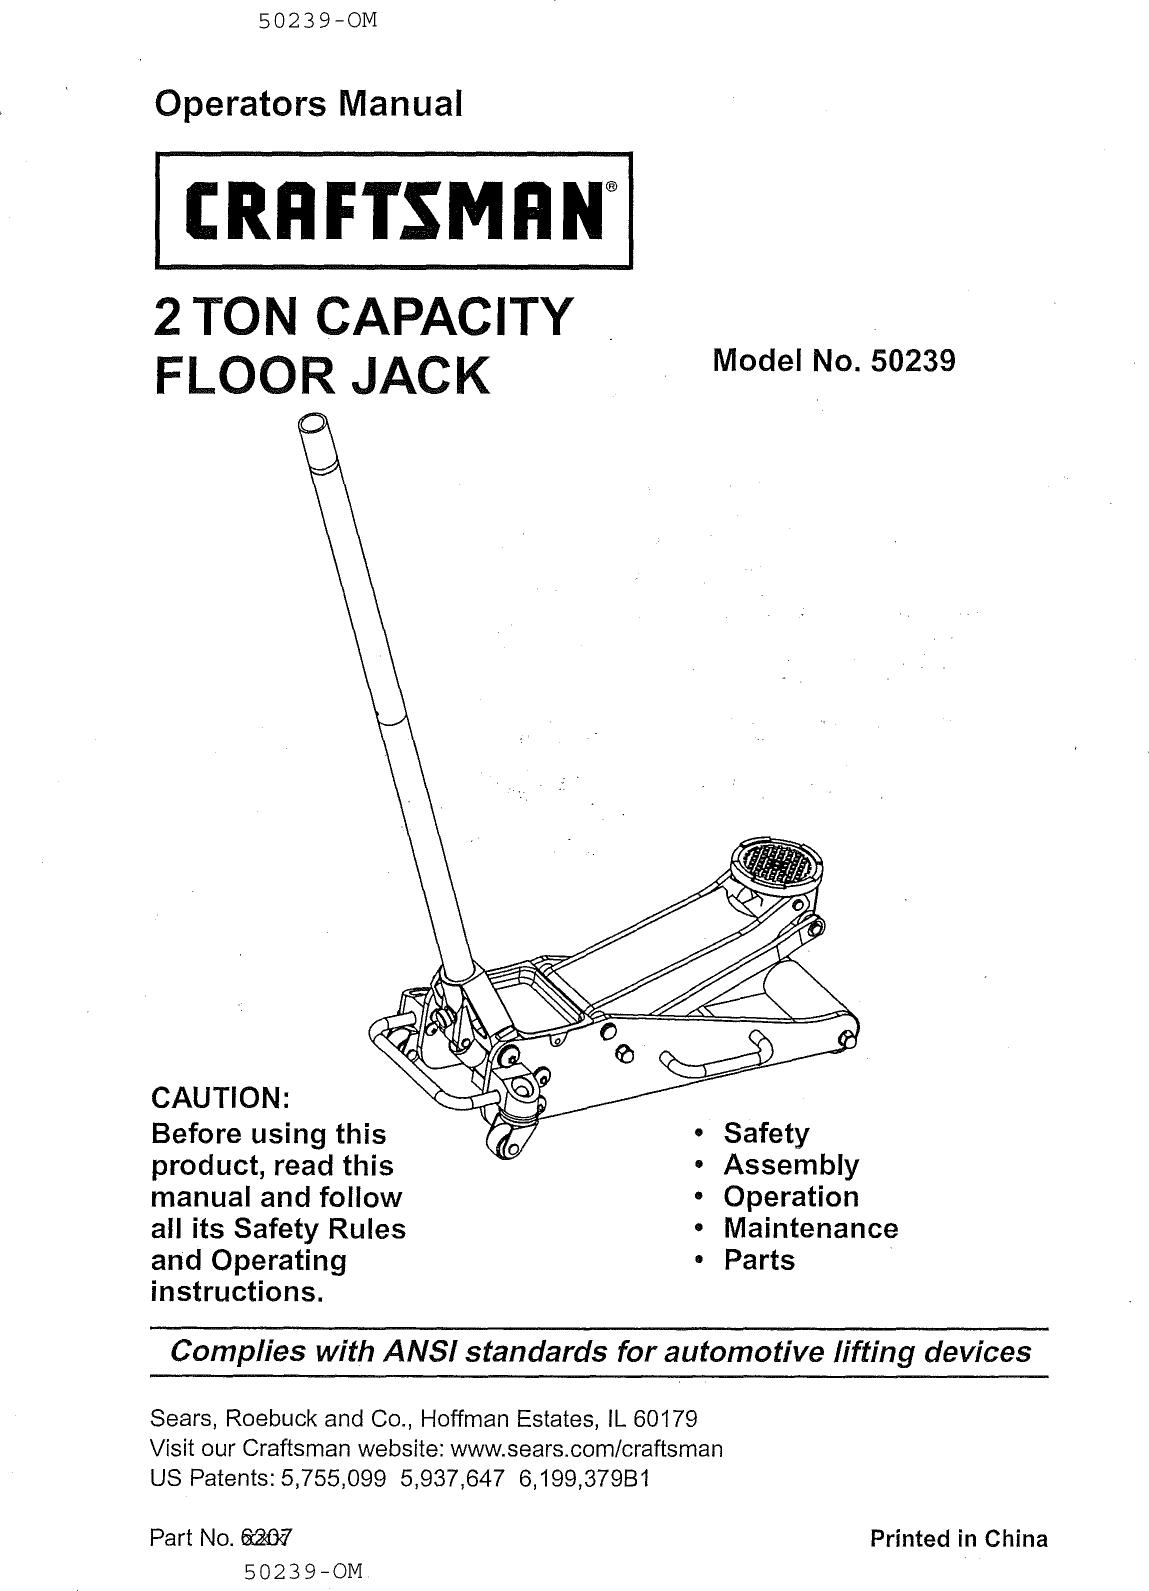 Craftsman Floor Jack Parts : craftsman, floor, parts, Craftsman, 21450239, 1101351L, Manual, FLOOR, Manuals, Guides